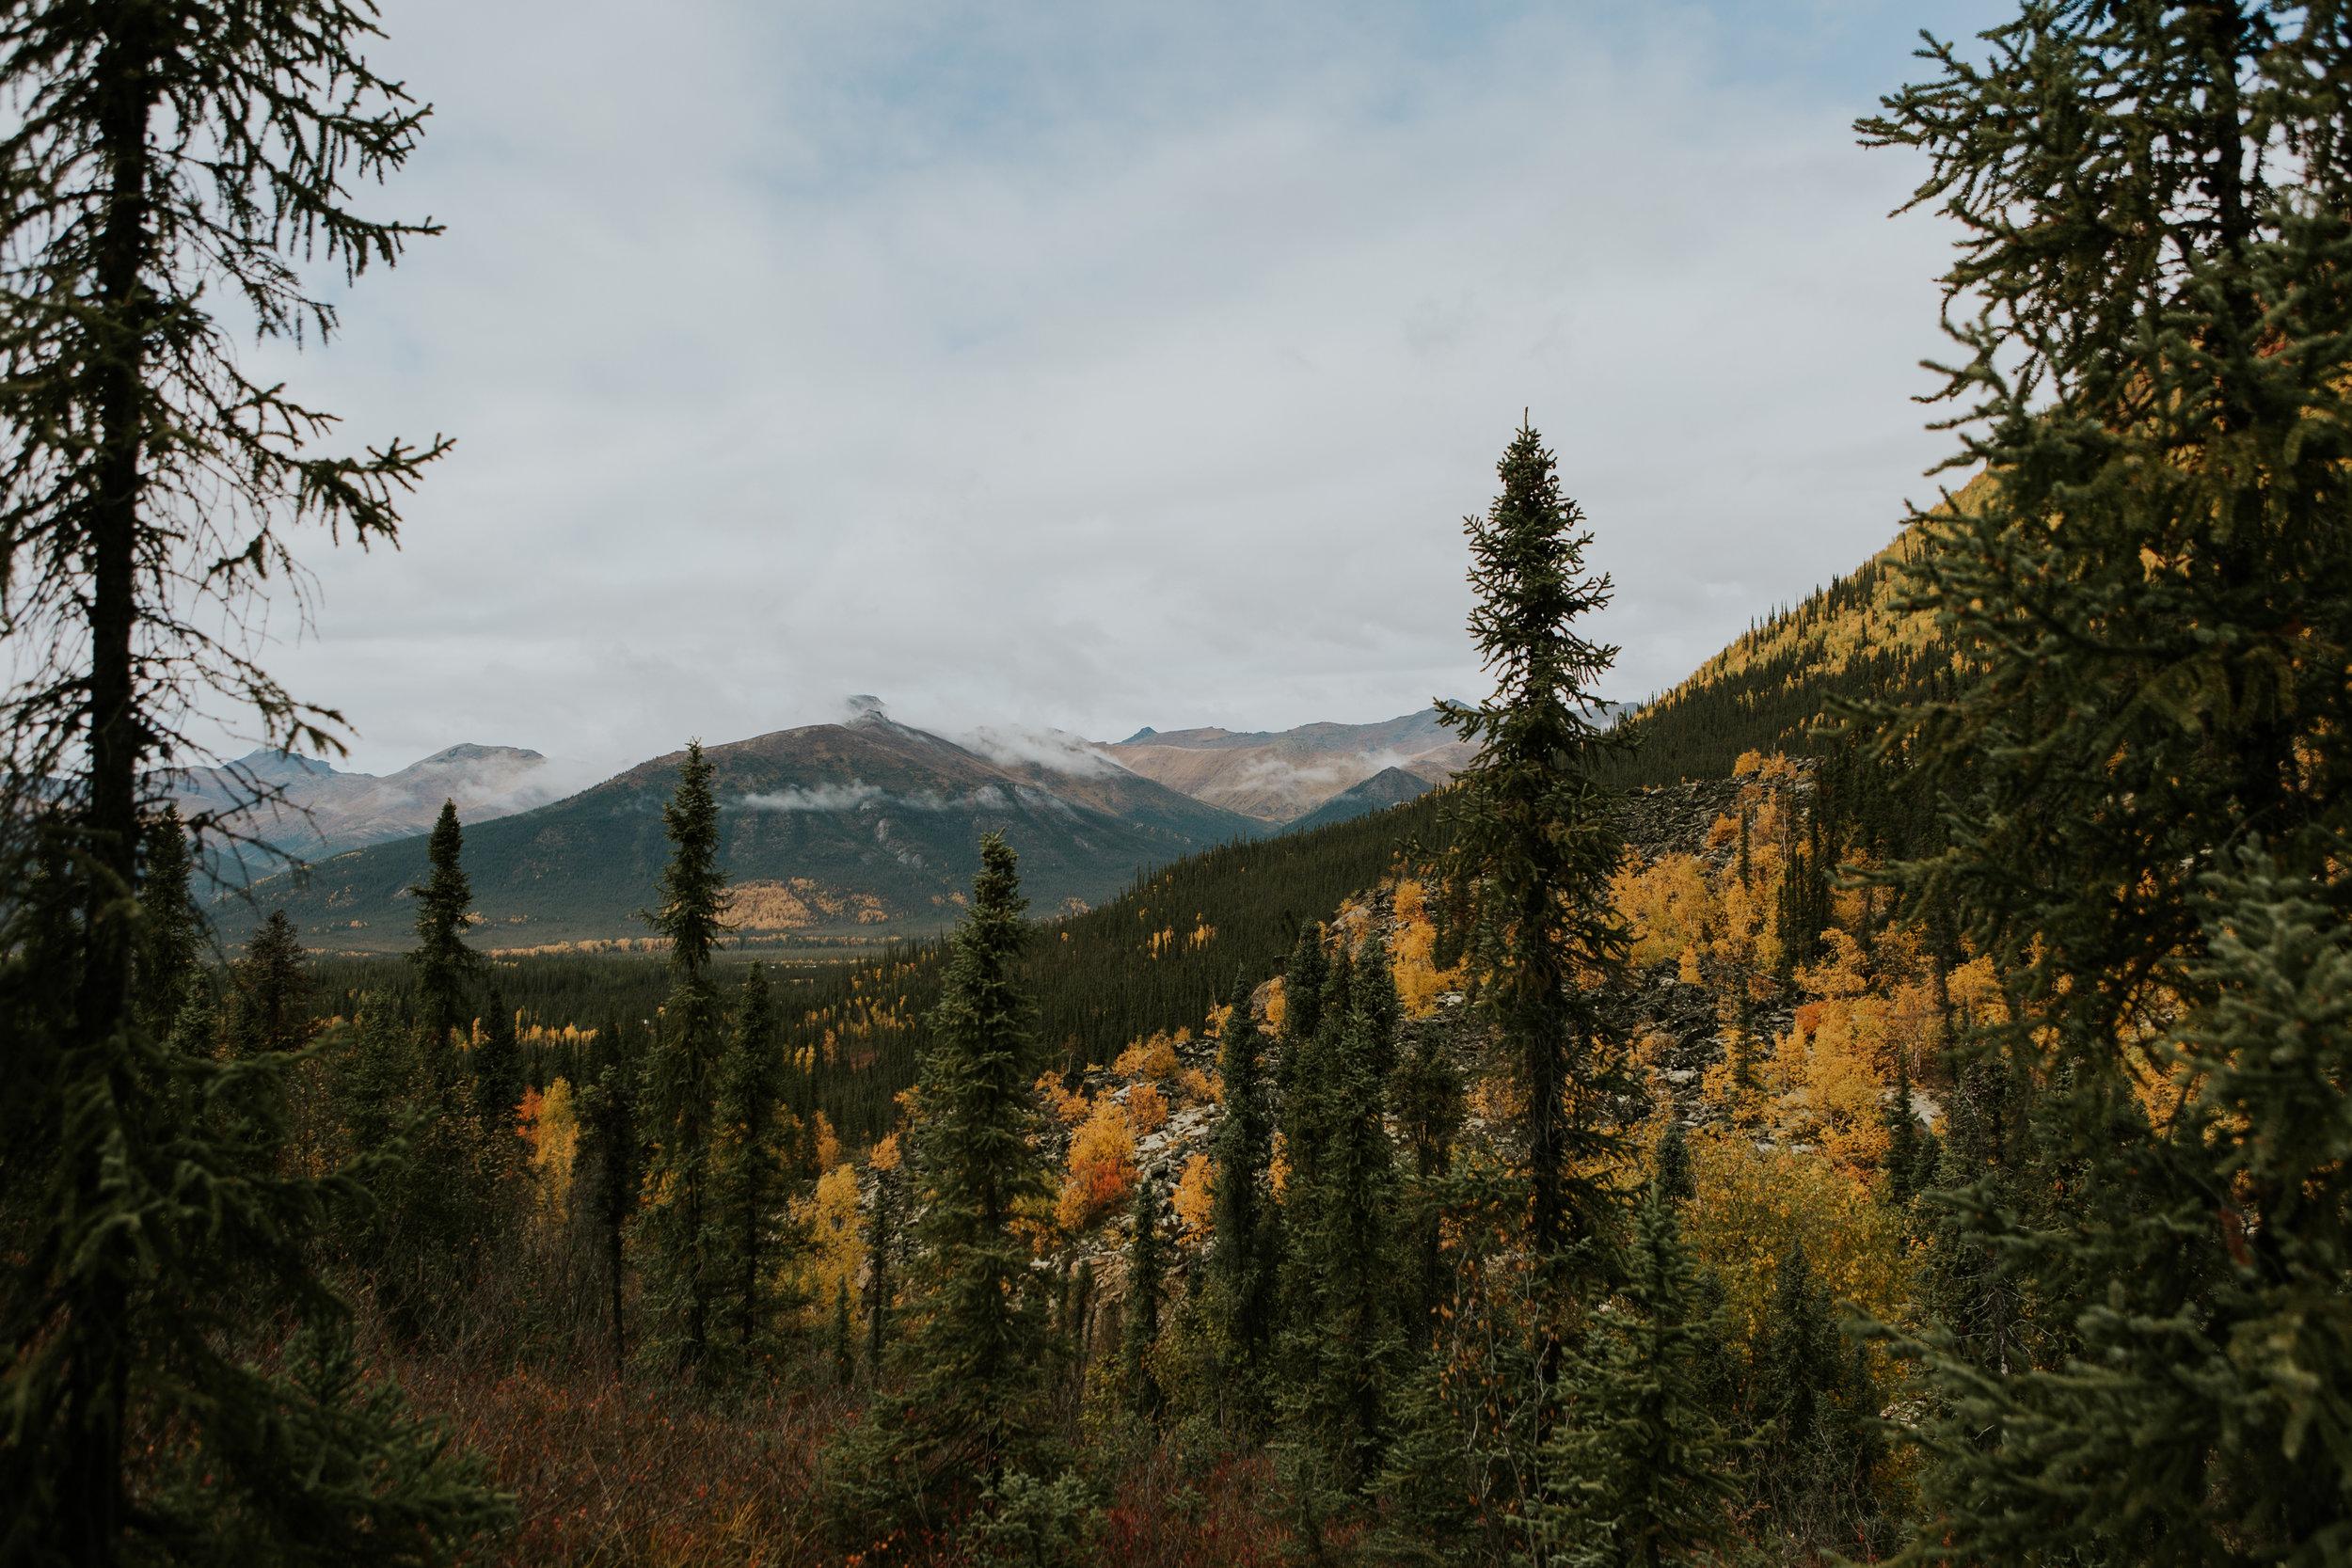 CindyGiovagnoli_Alaska_KoyukukRiver_SukakpakMountain_JimRiver_ArcticCircle_fly_fishing_September-040.jpg